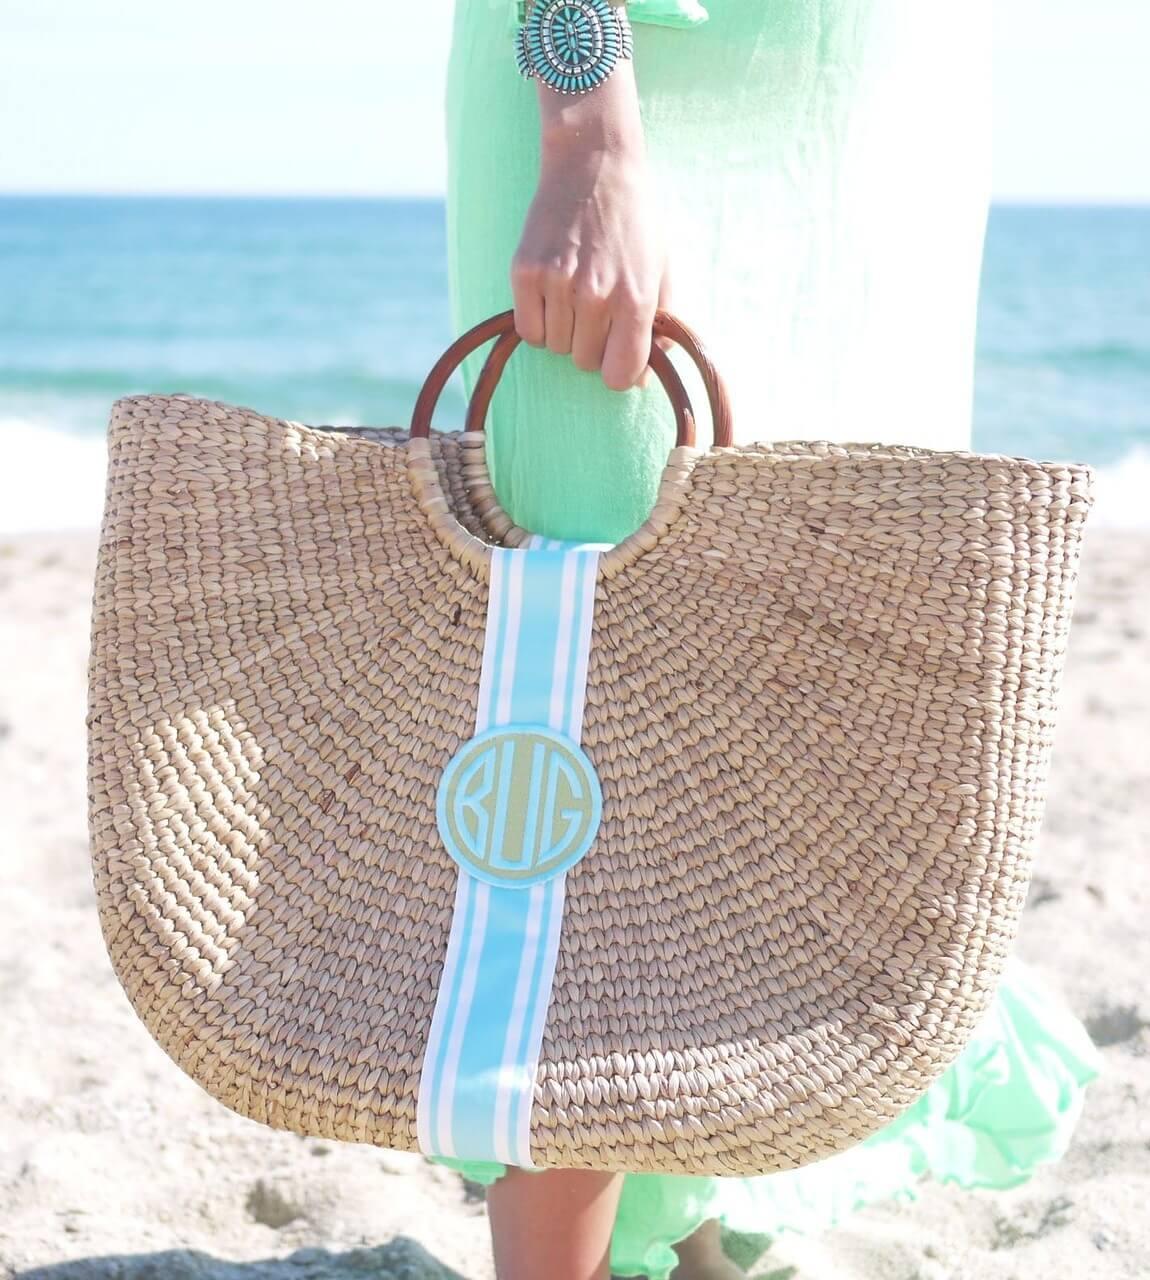 Monogrammed_beach_bag_straw_basket_calypso_dress_buggy_designs__79152.1403550931.1280.1280